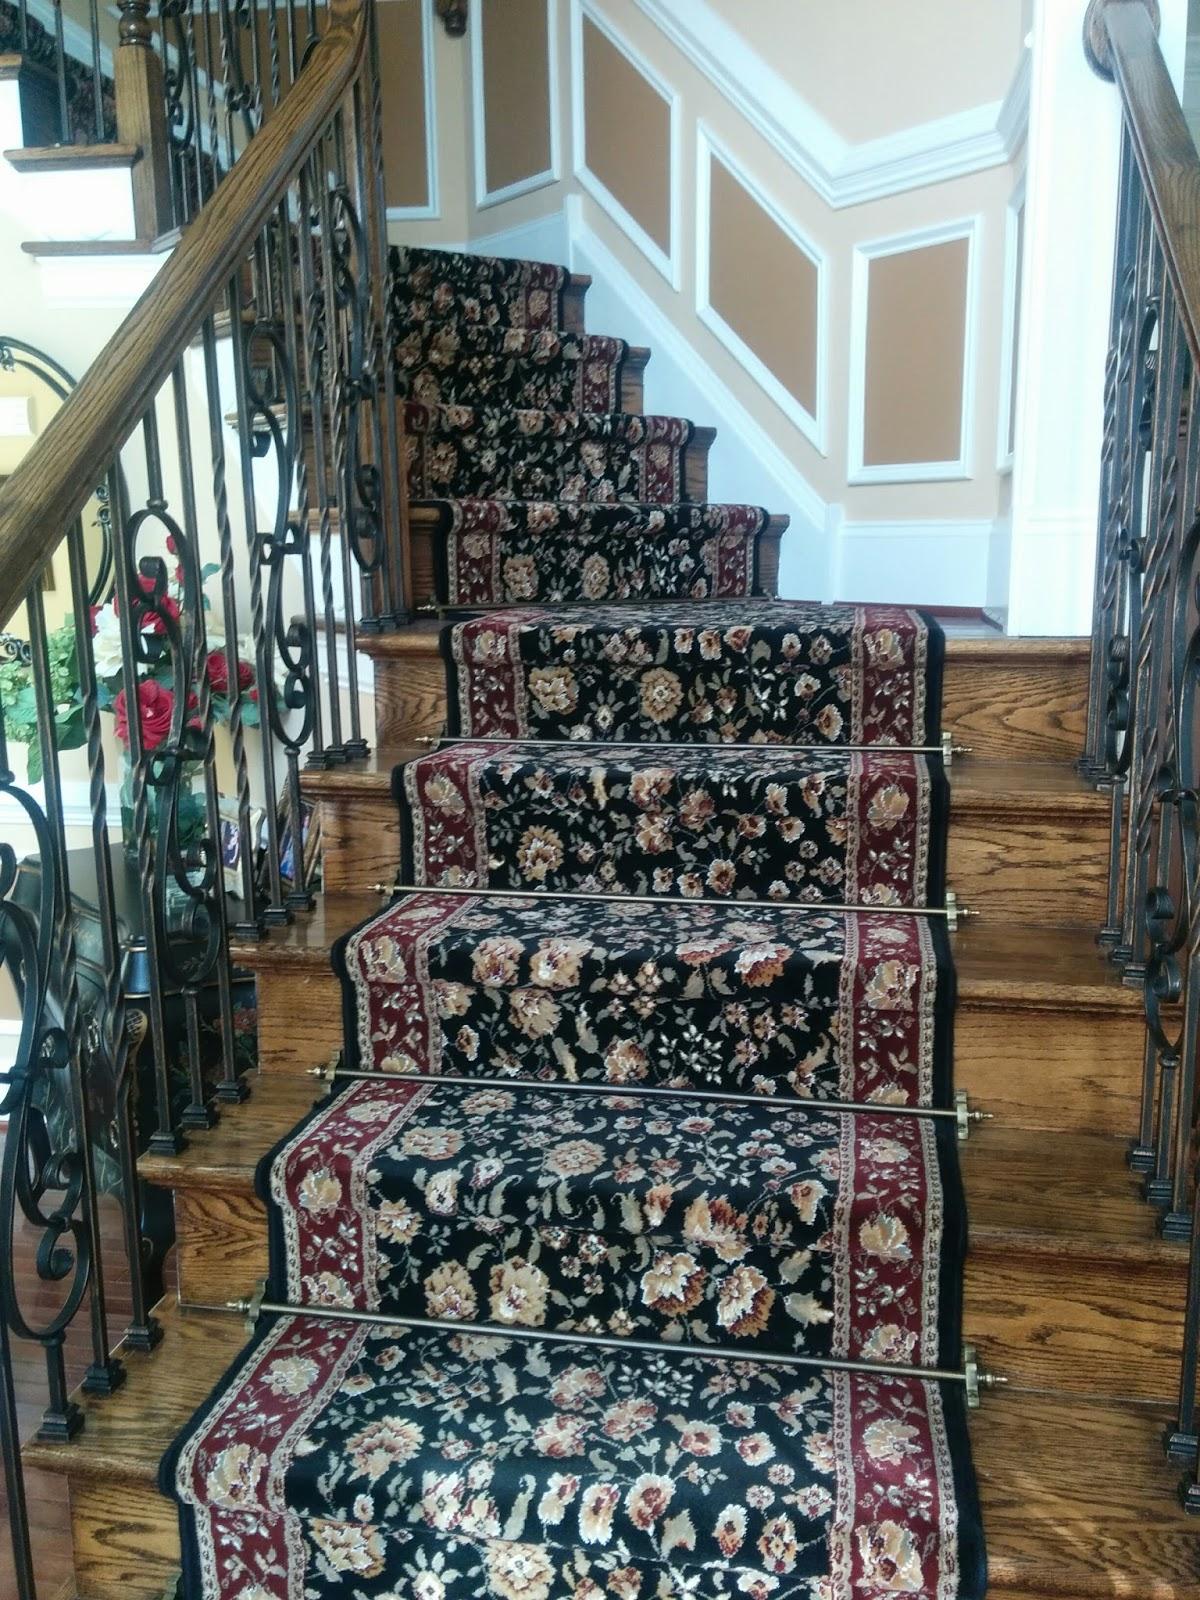 Floor Installation Photos Kane Carpet Stair Runner With Zoroufy | Decorative Carpet For Stairs | Rectangular Cord Treads | Gingham | Brown | Animal Print | Stair Runner Matching Landing